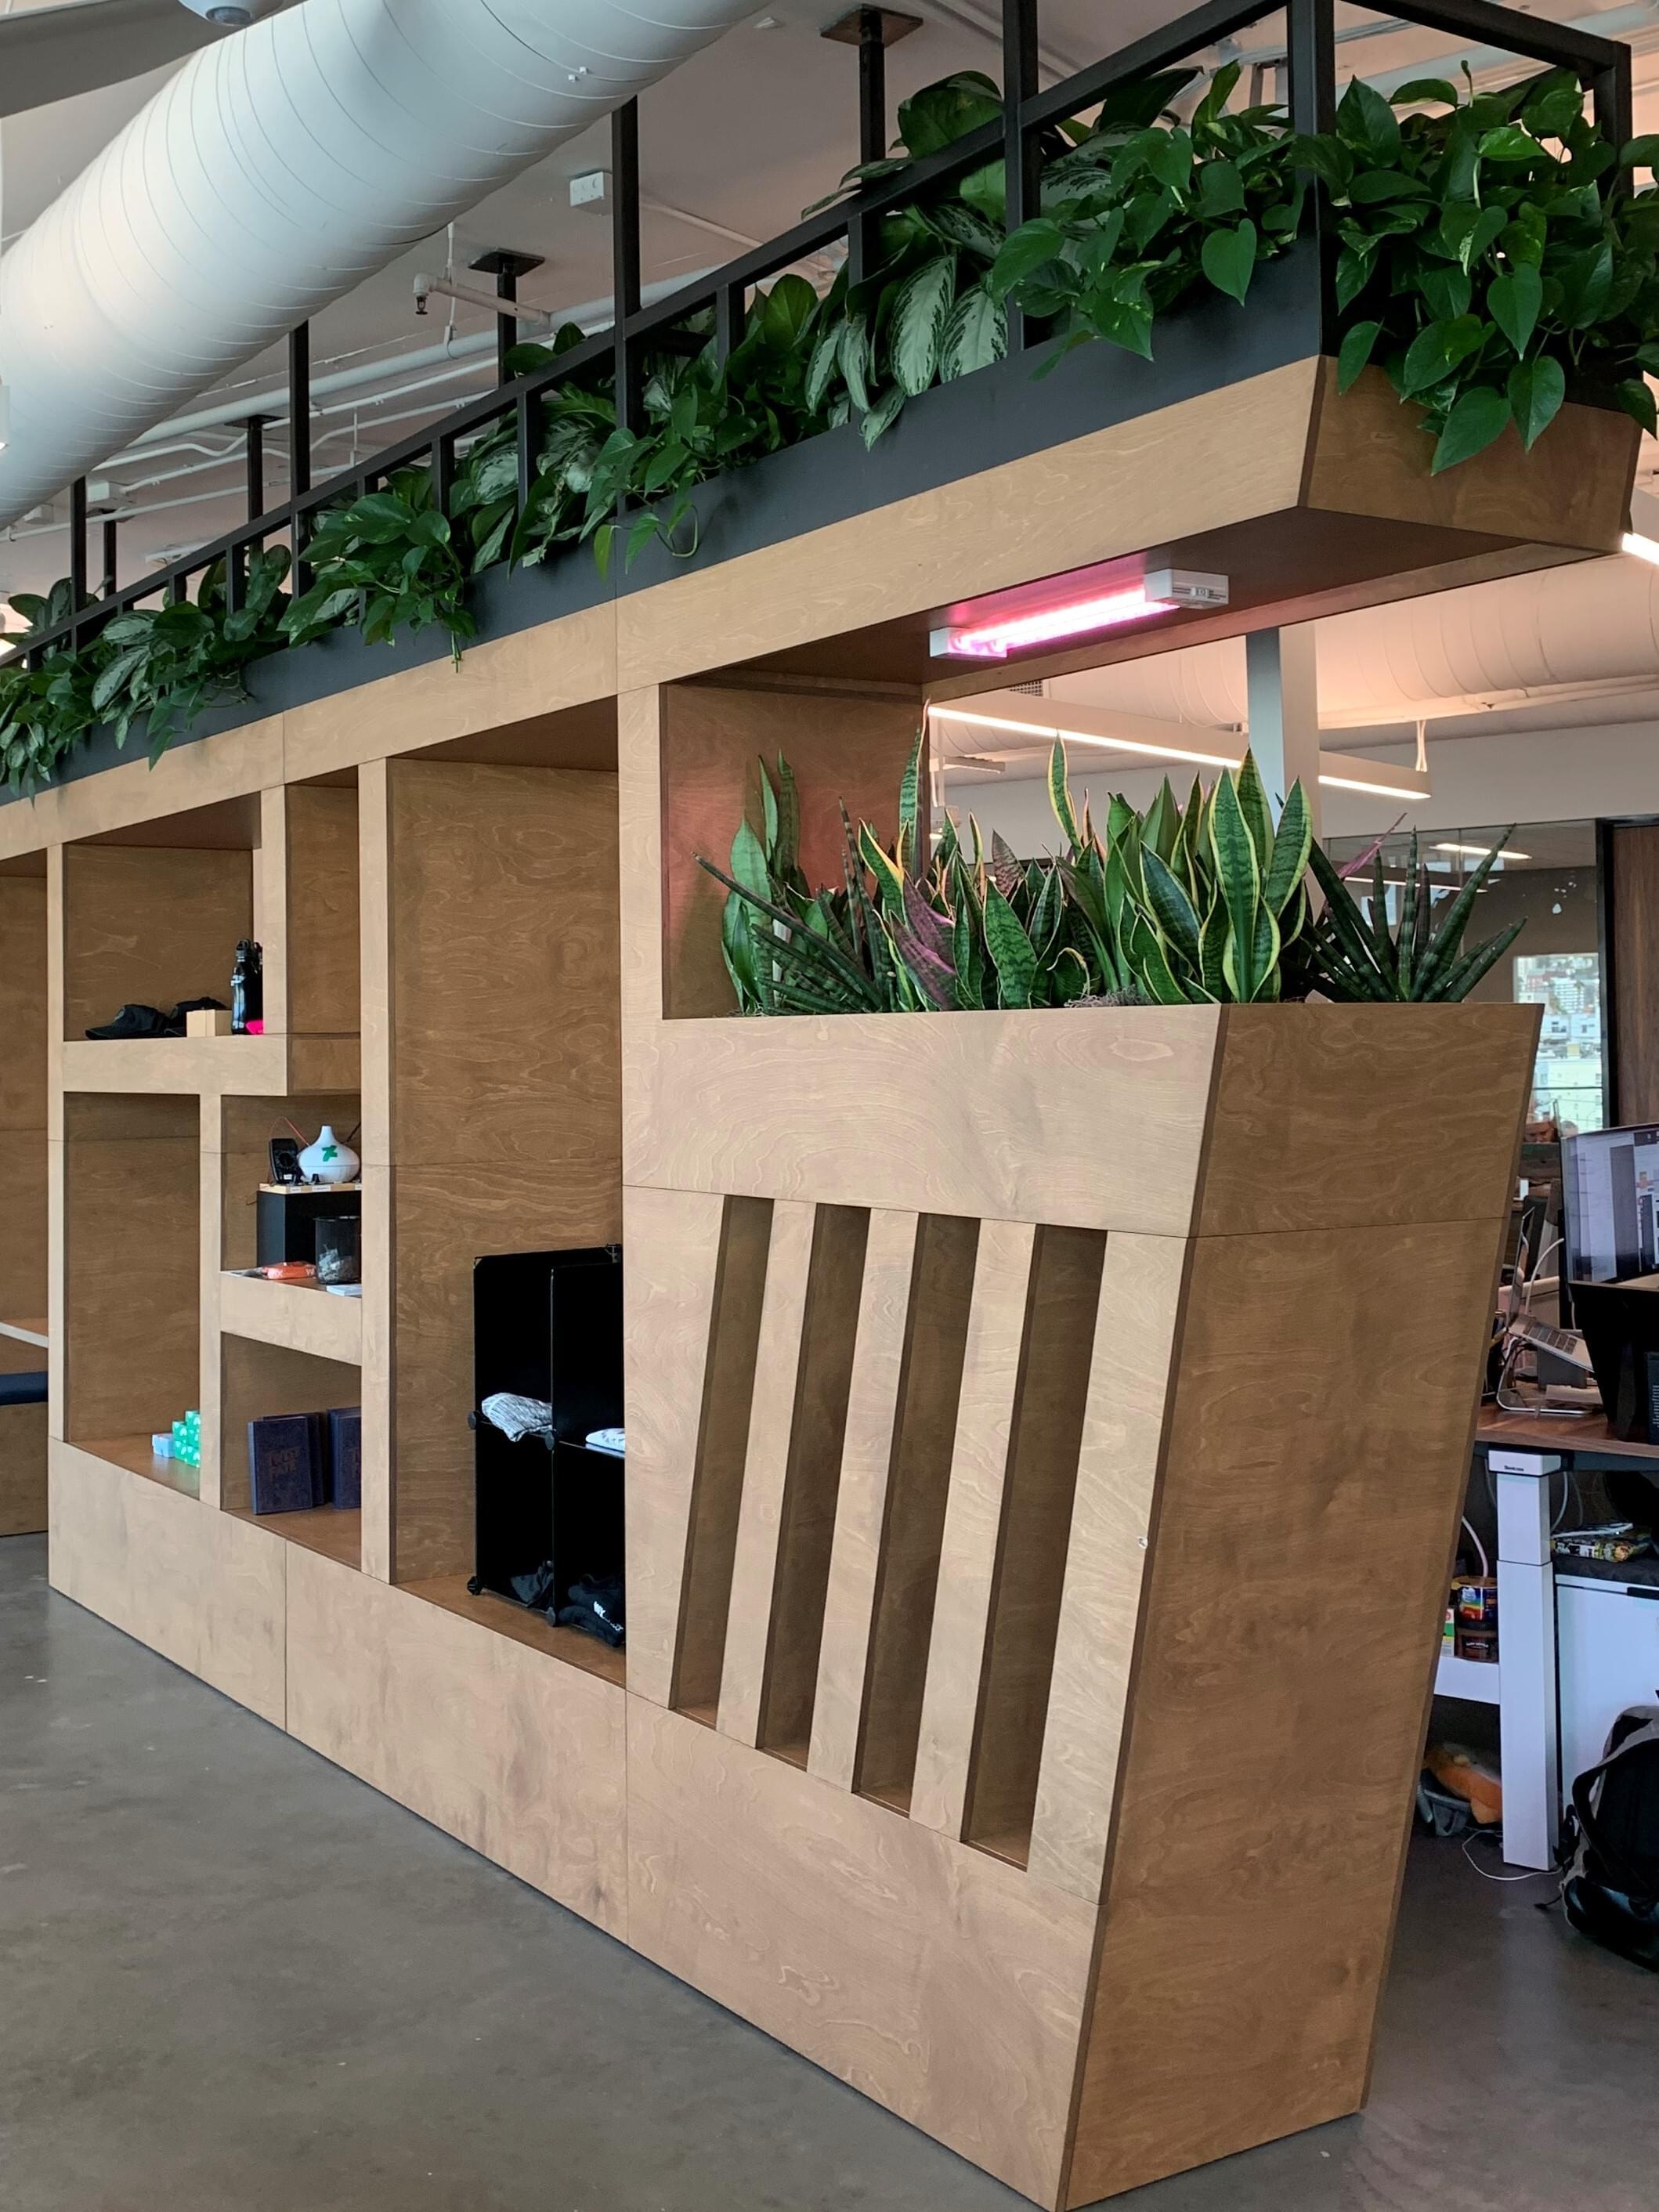 Interior landscape, planters, custom planters, plant wall, desk plant